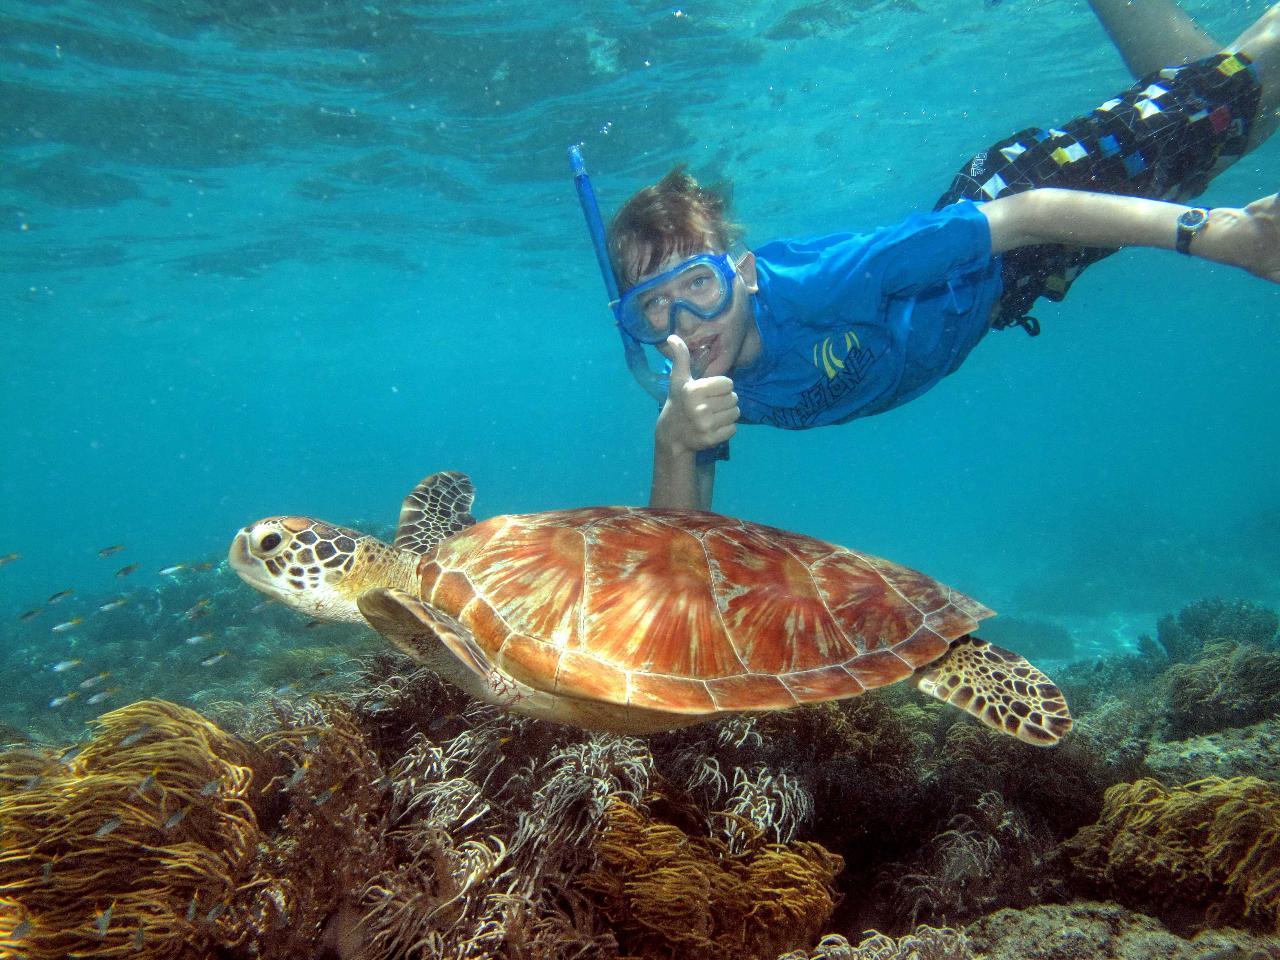 2 Day Reef, Daintree Rainforest & Culture tour – featuring Ocean Spirit